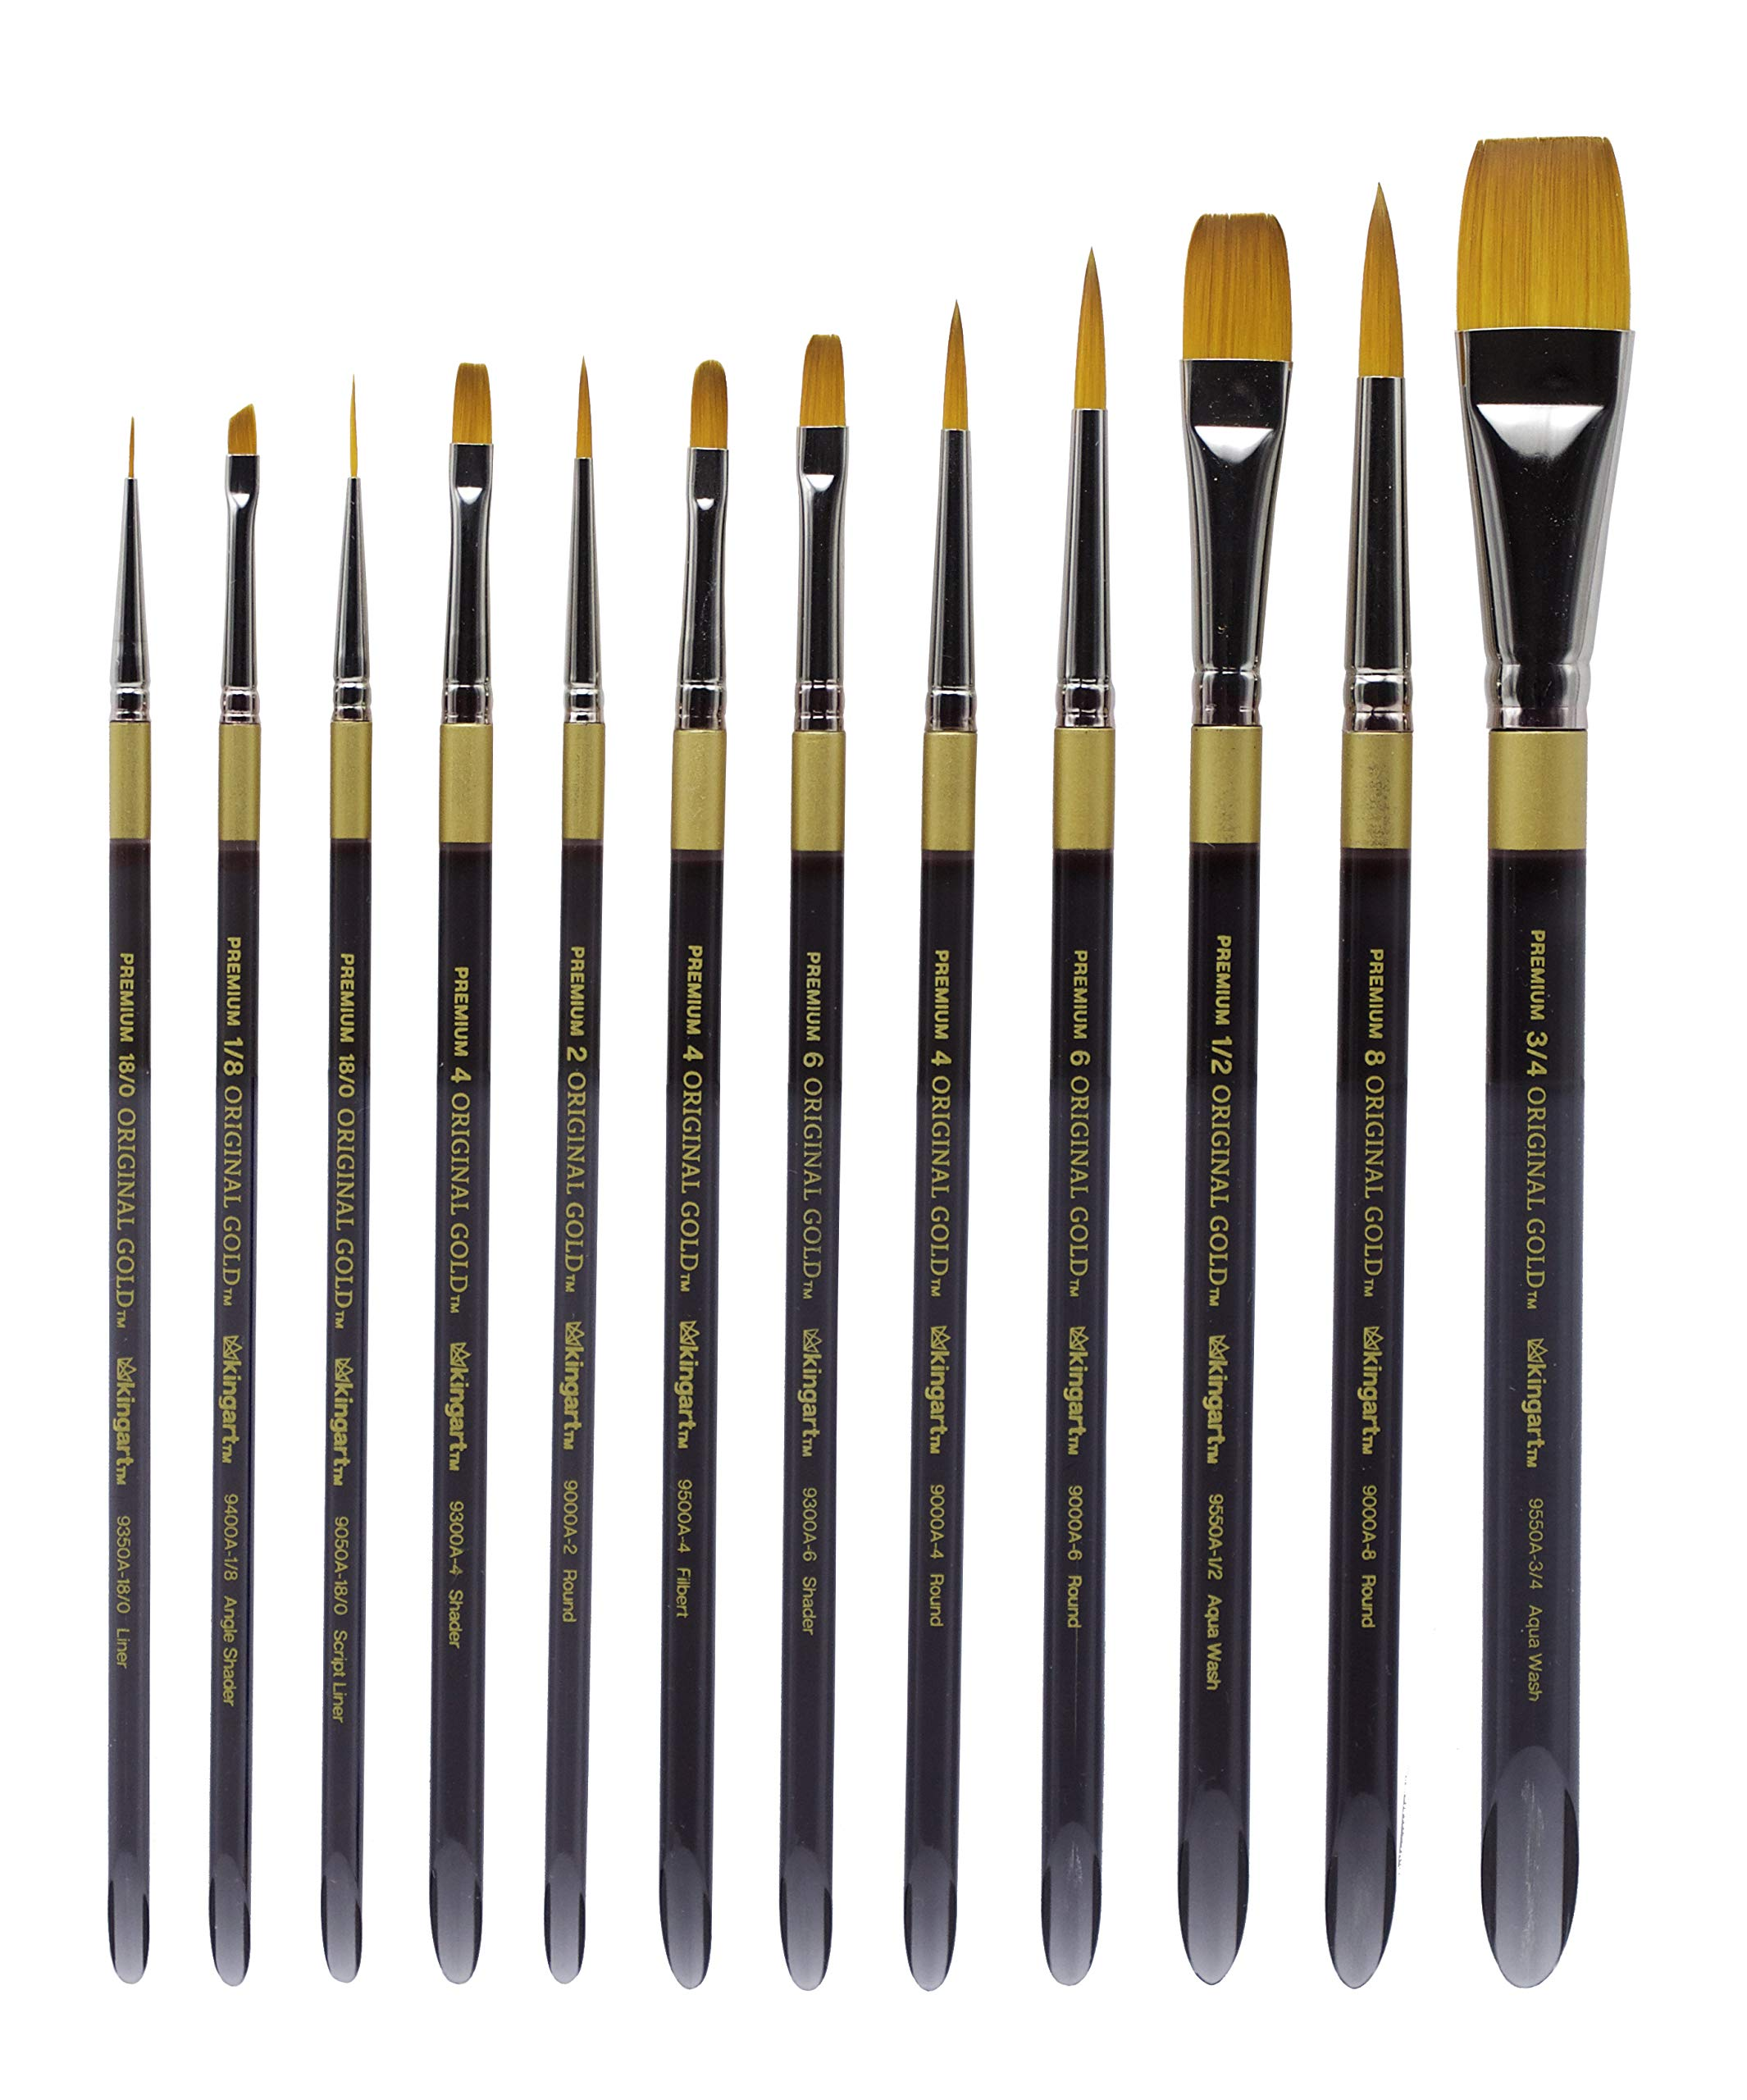 KINGART 1000D Original Golden TAKLON Acrylic Handle Set of 12 Paint Brush Set, Assorted, Black, Gold, Silver by KINGART